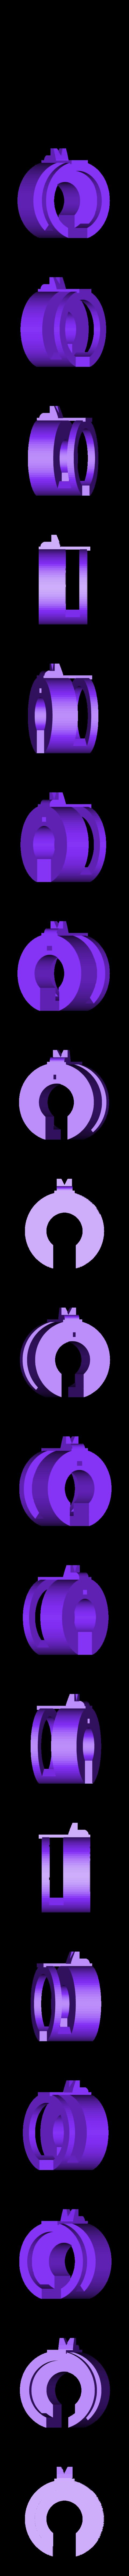 004_Harkonnen_BarrelBack.stl Download free OBJ file Hellsing ARMS Anti-Tank Cannon - Harkonnen - Airsoft grenade launcher • 3D printing design, Snorri